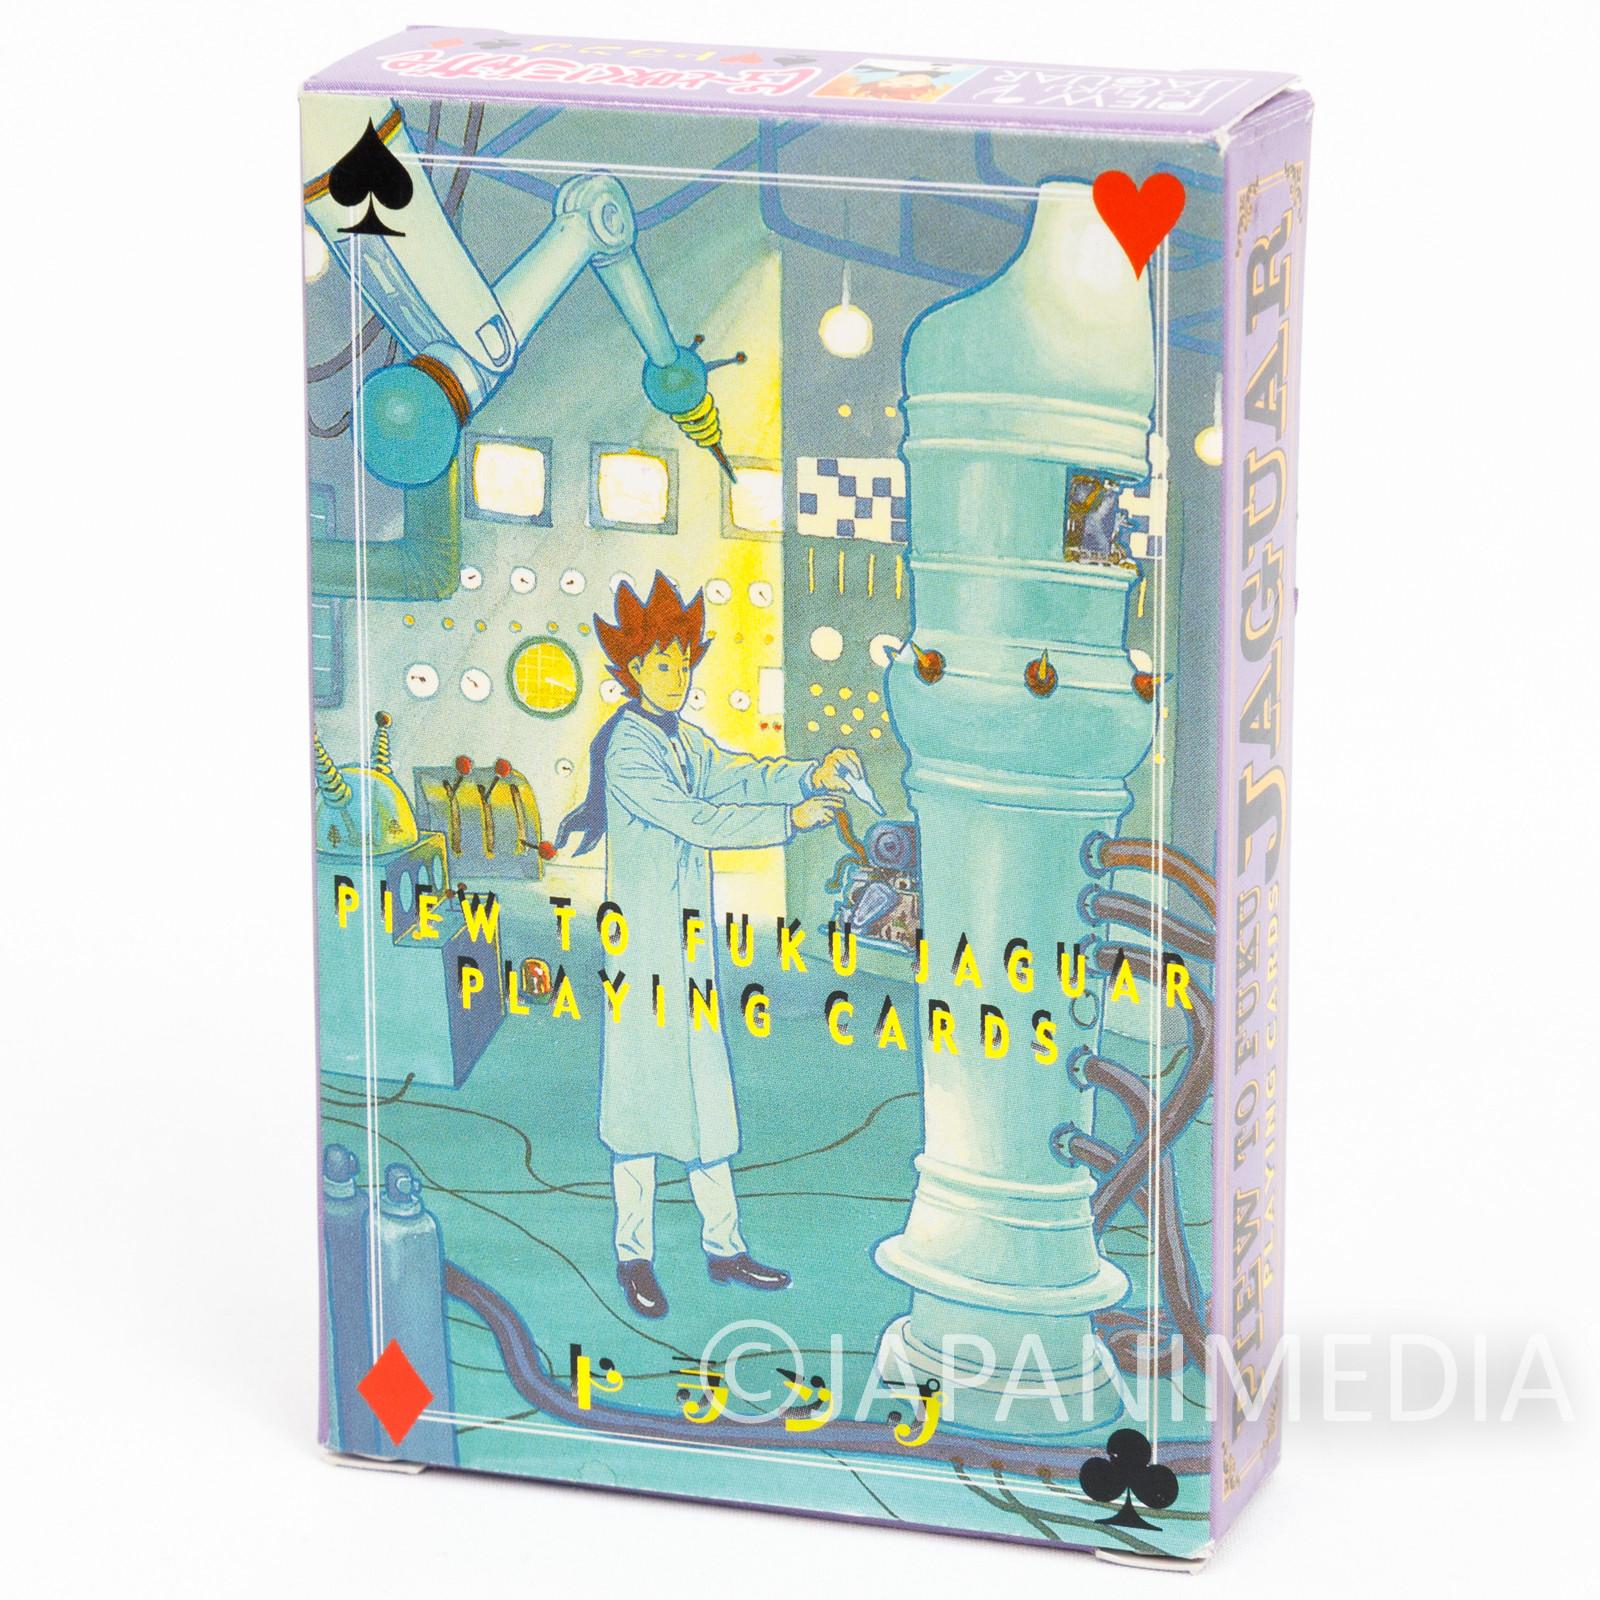 RARE! Pyu to Fuku! Jaguar Trump Playing Cards Jump Festa 2004 JAPAN ANIME